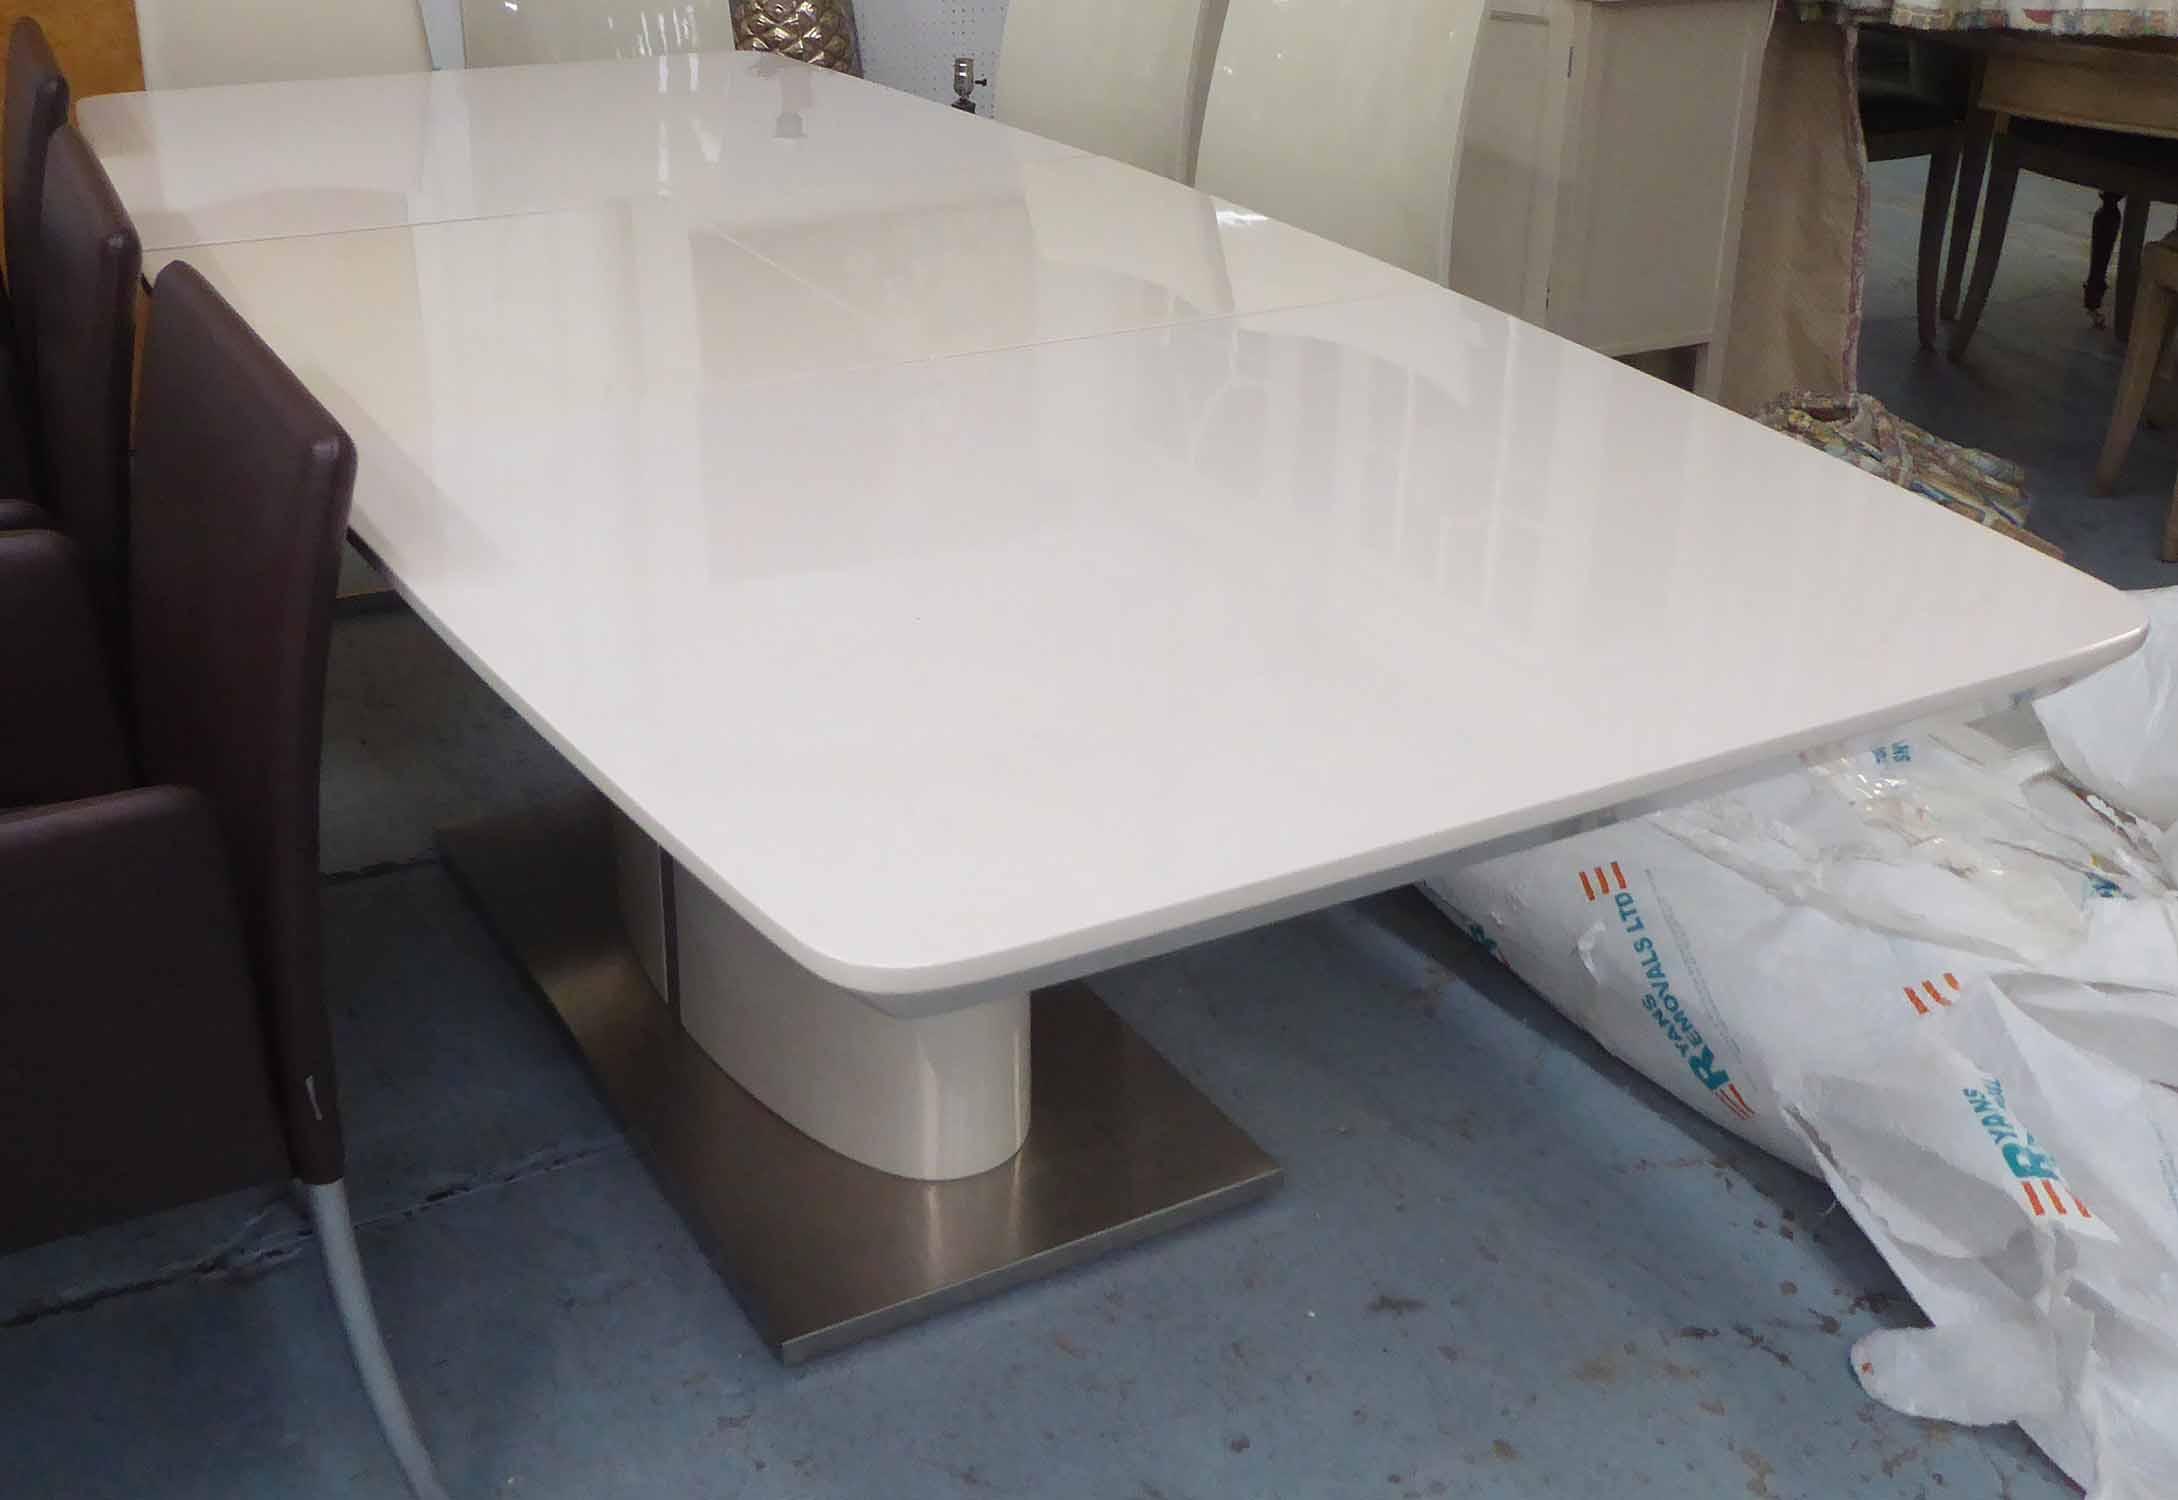 Extending Dining Table In White Melamine Finish On Central